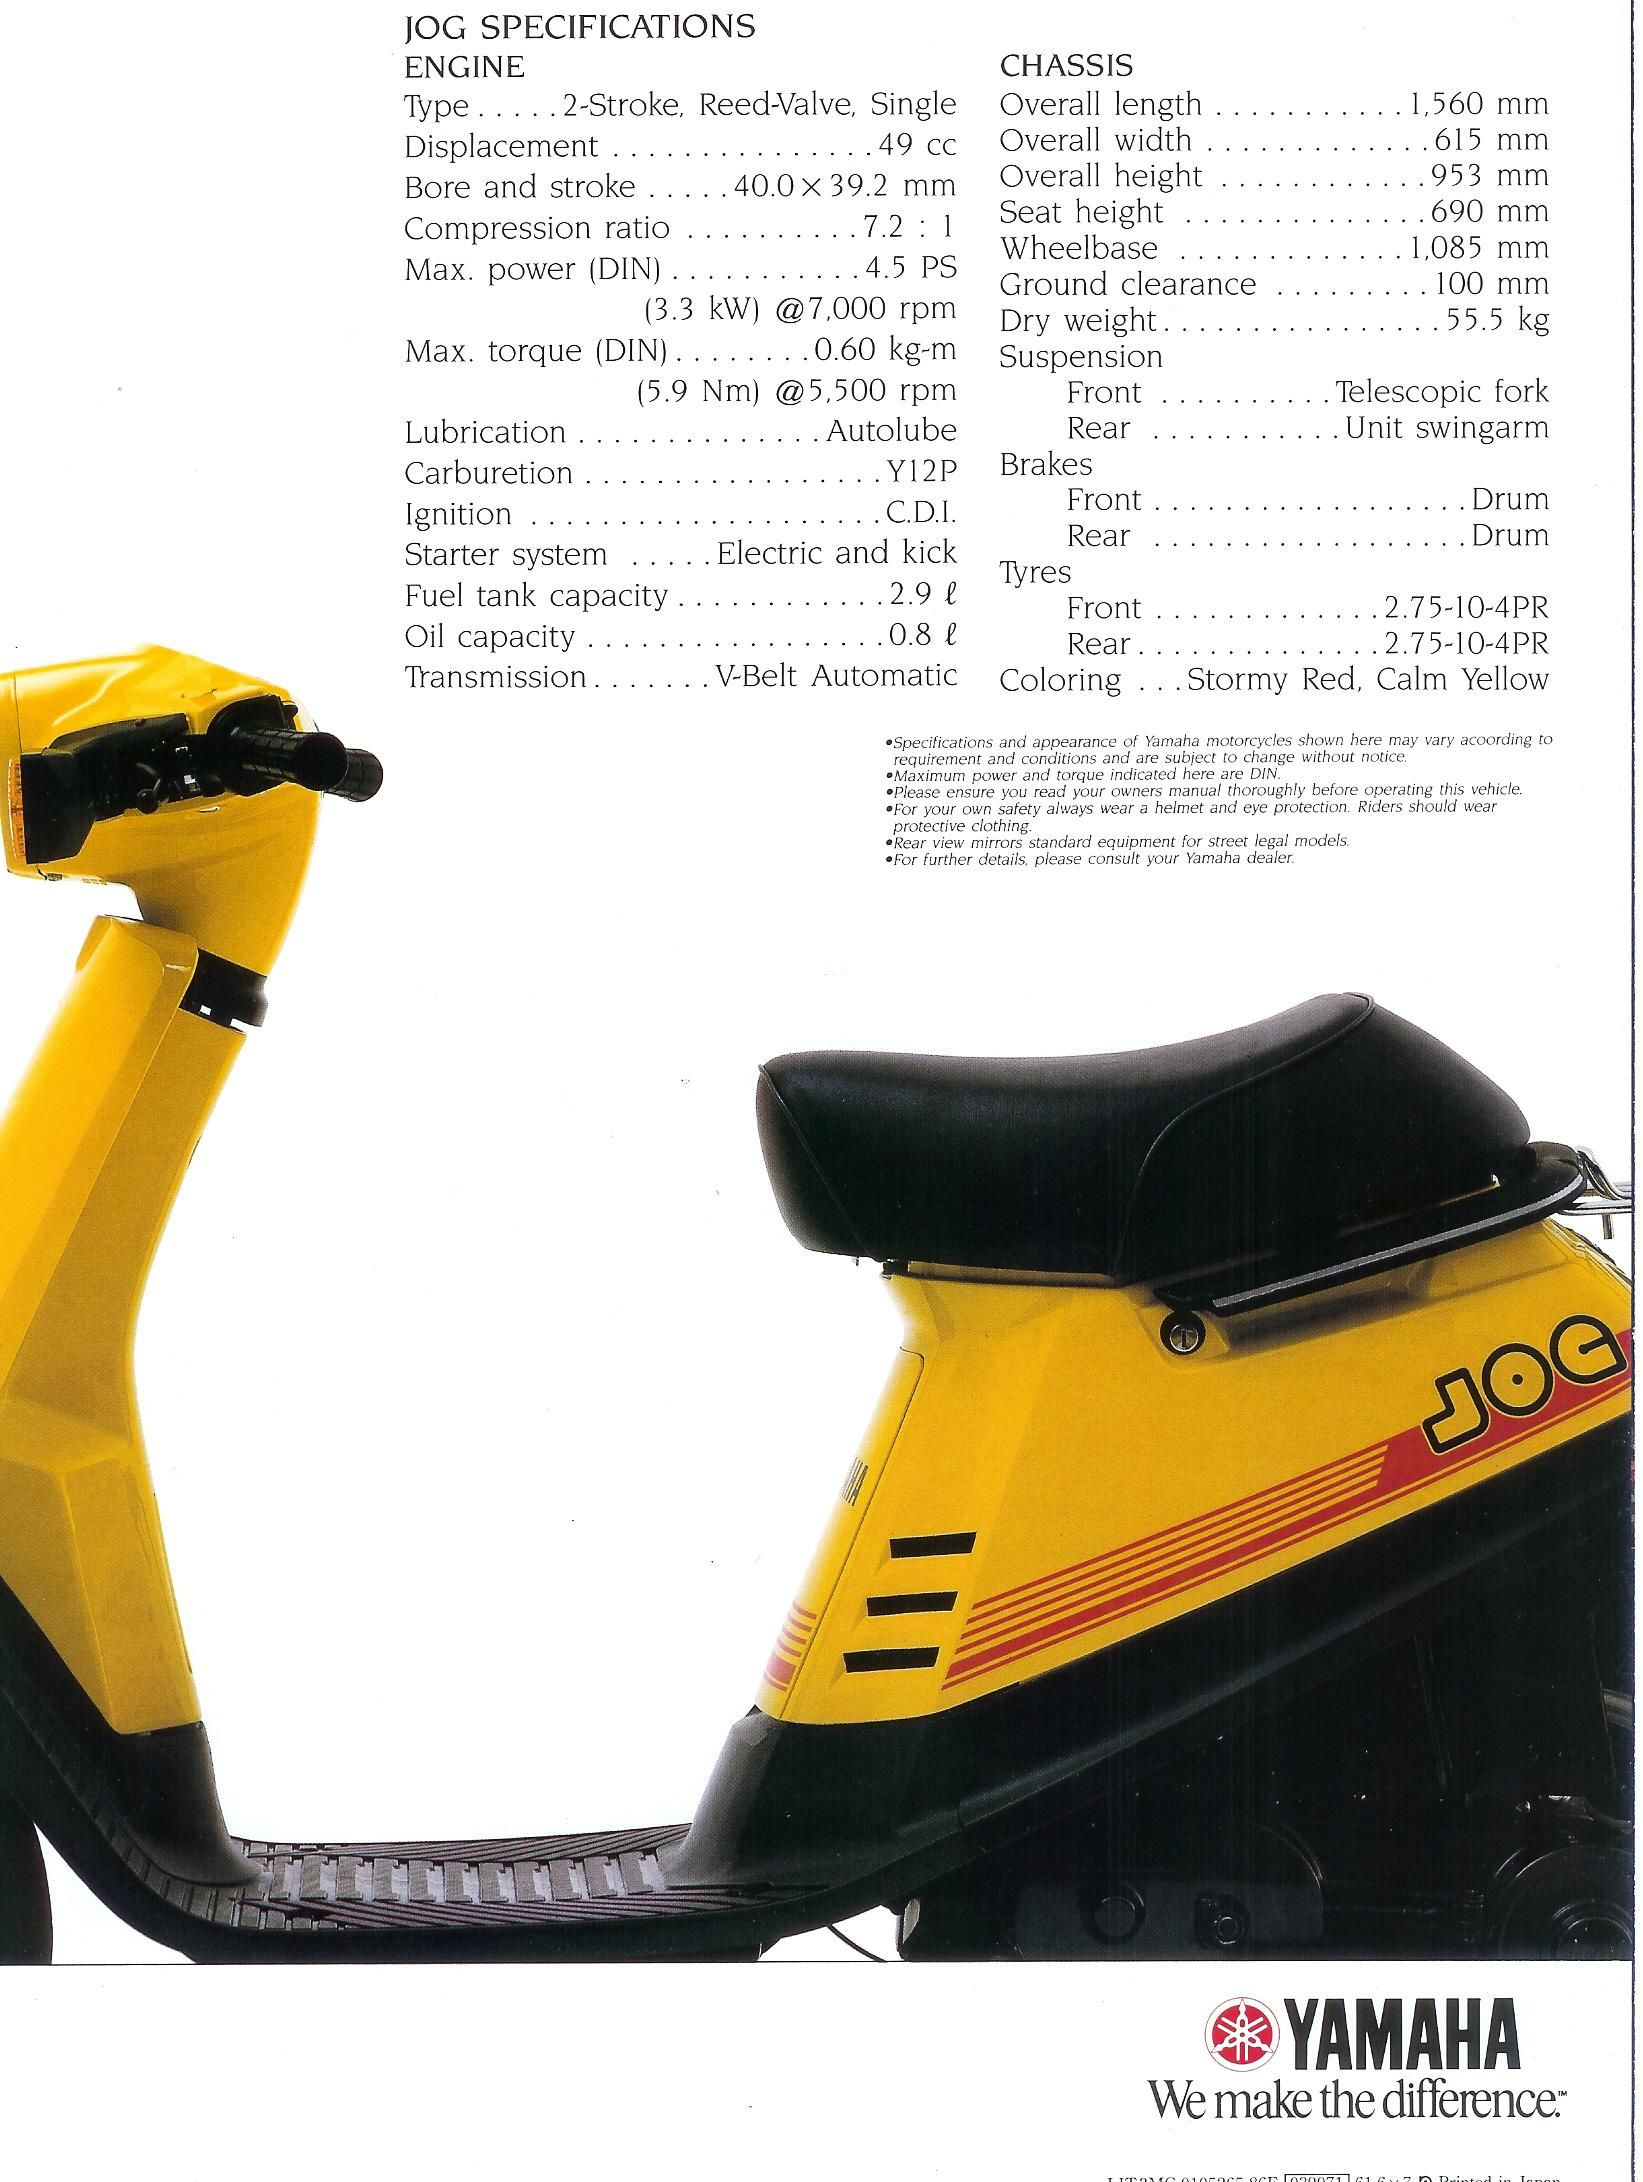 [GJFJ_338]  0FD2ED Manual Yamaha Jog 50cc Scooter   Wiring Library   1992 Yamaha Jog Wiring Diagram      Wiring Library